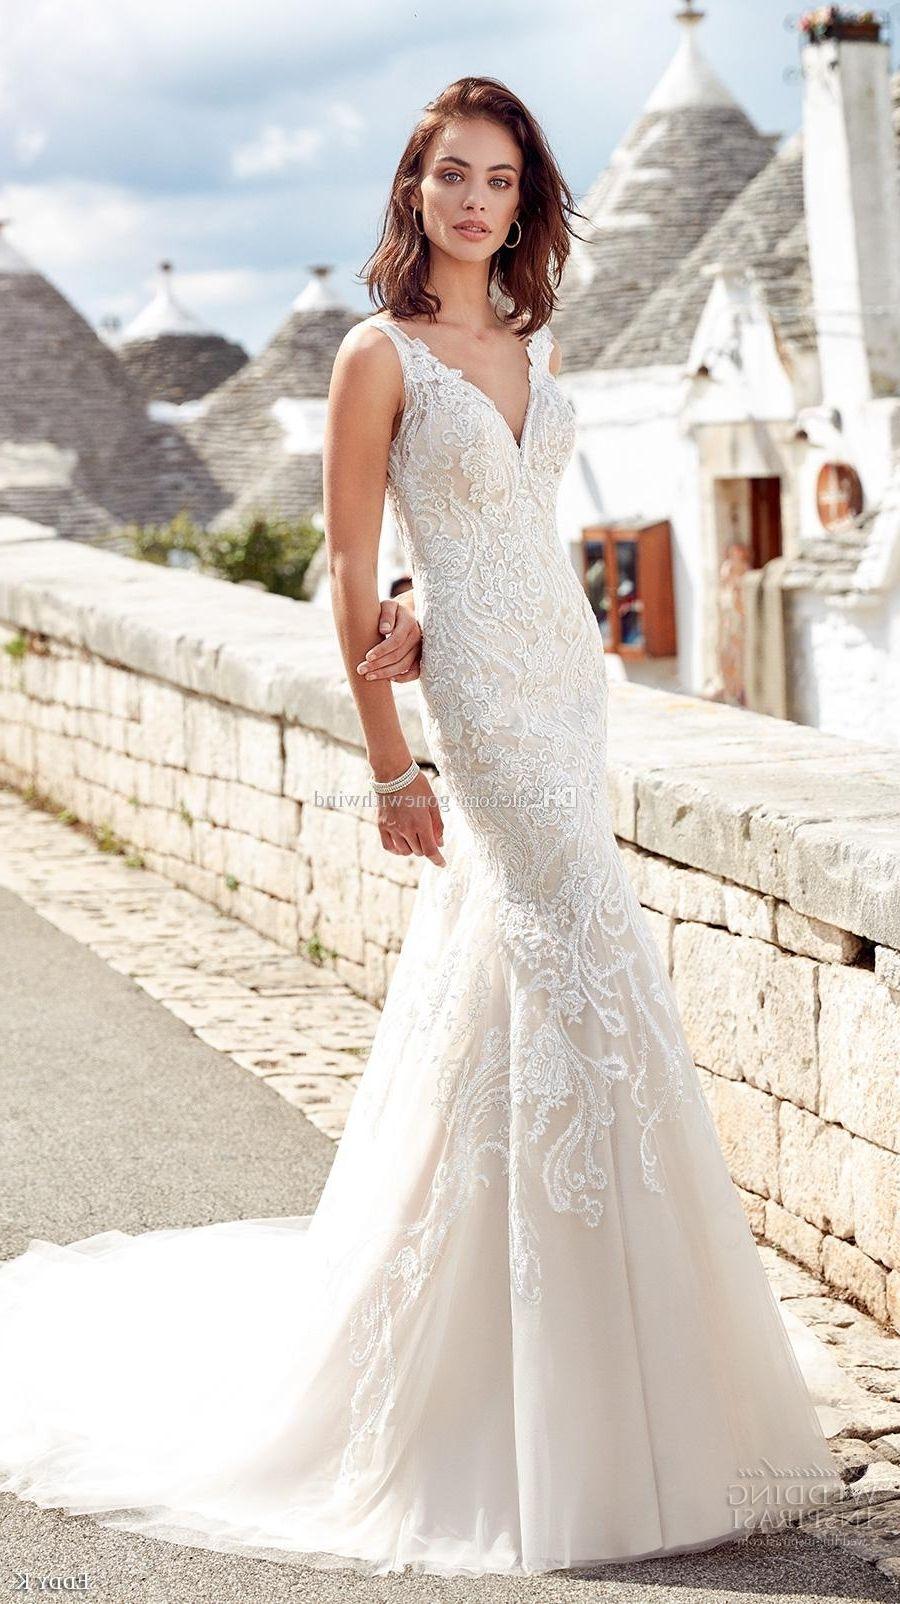 Wedding dresses for winter wedding dress pinterest